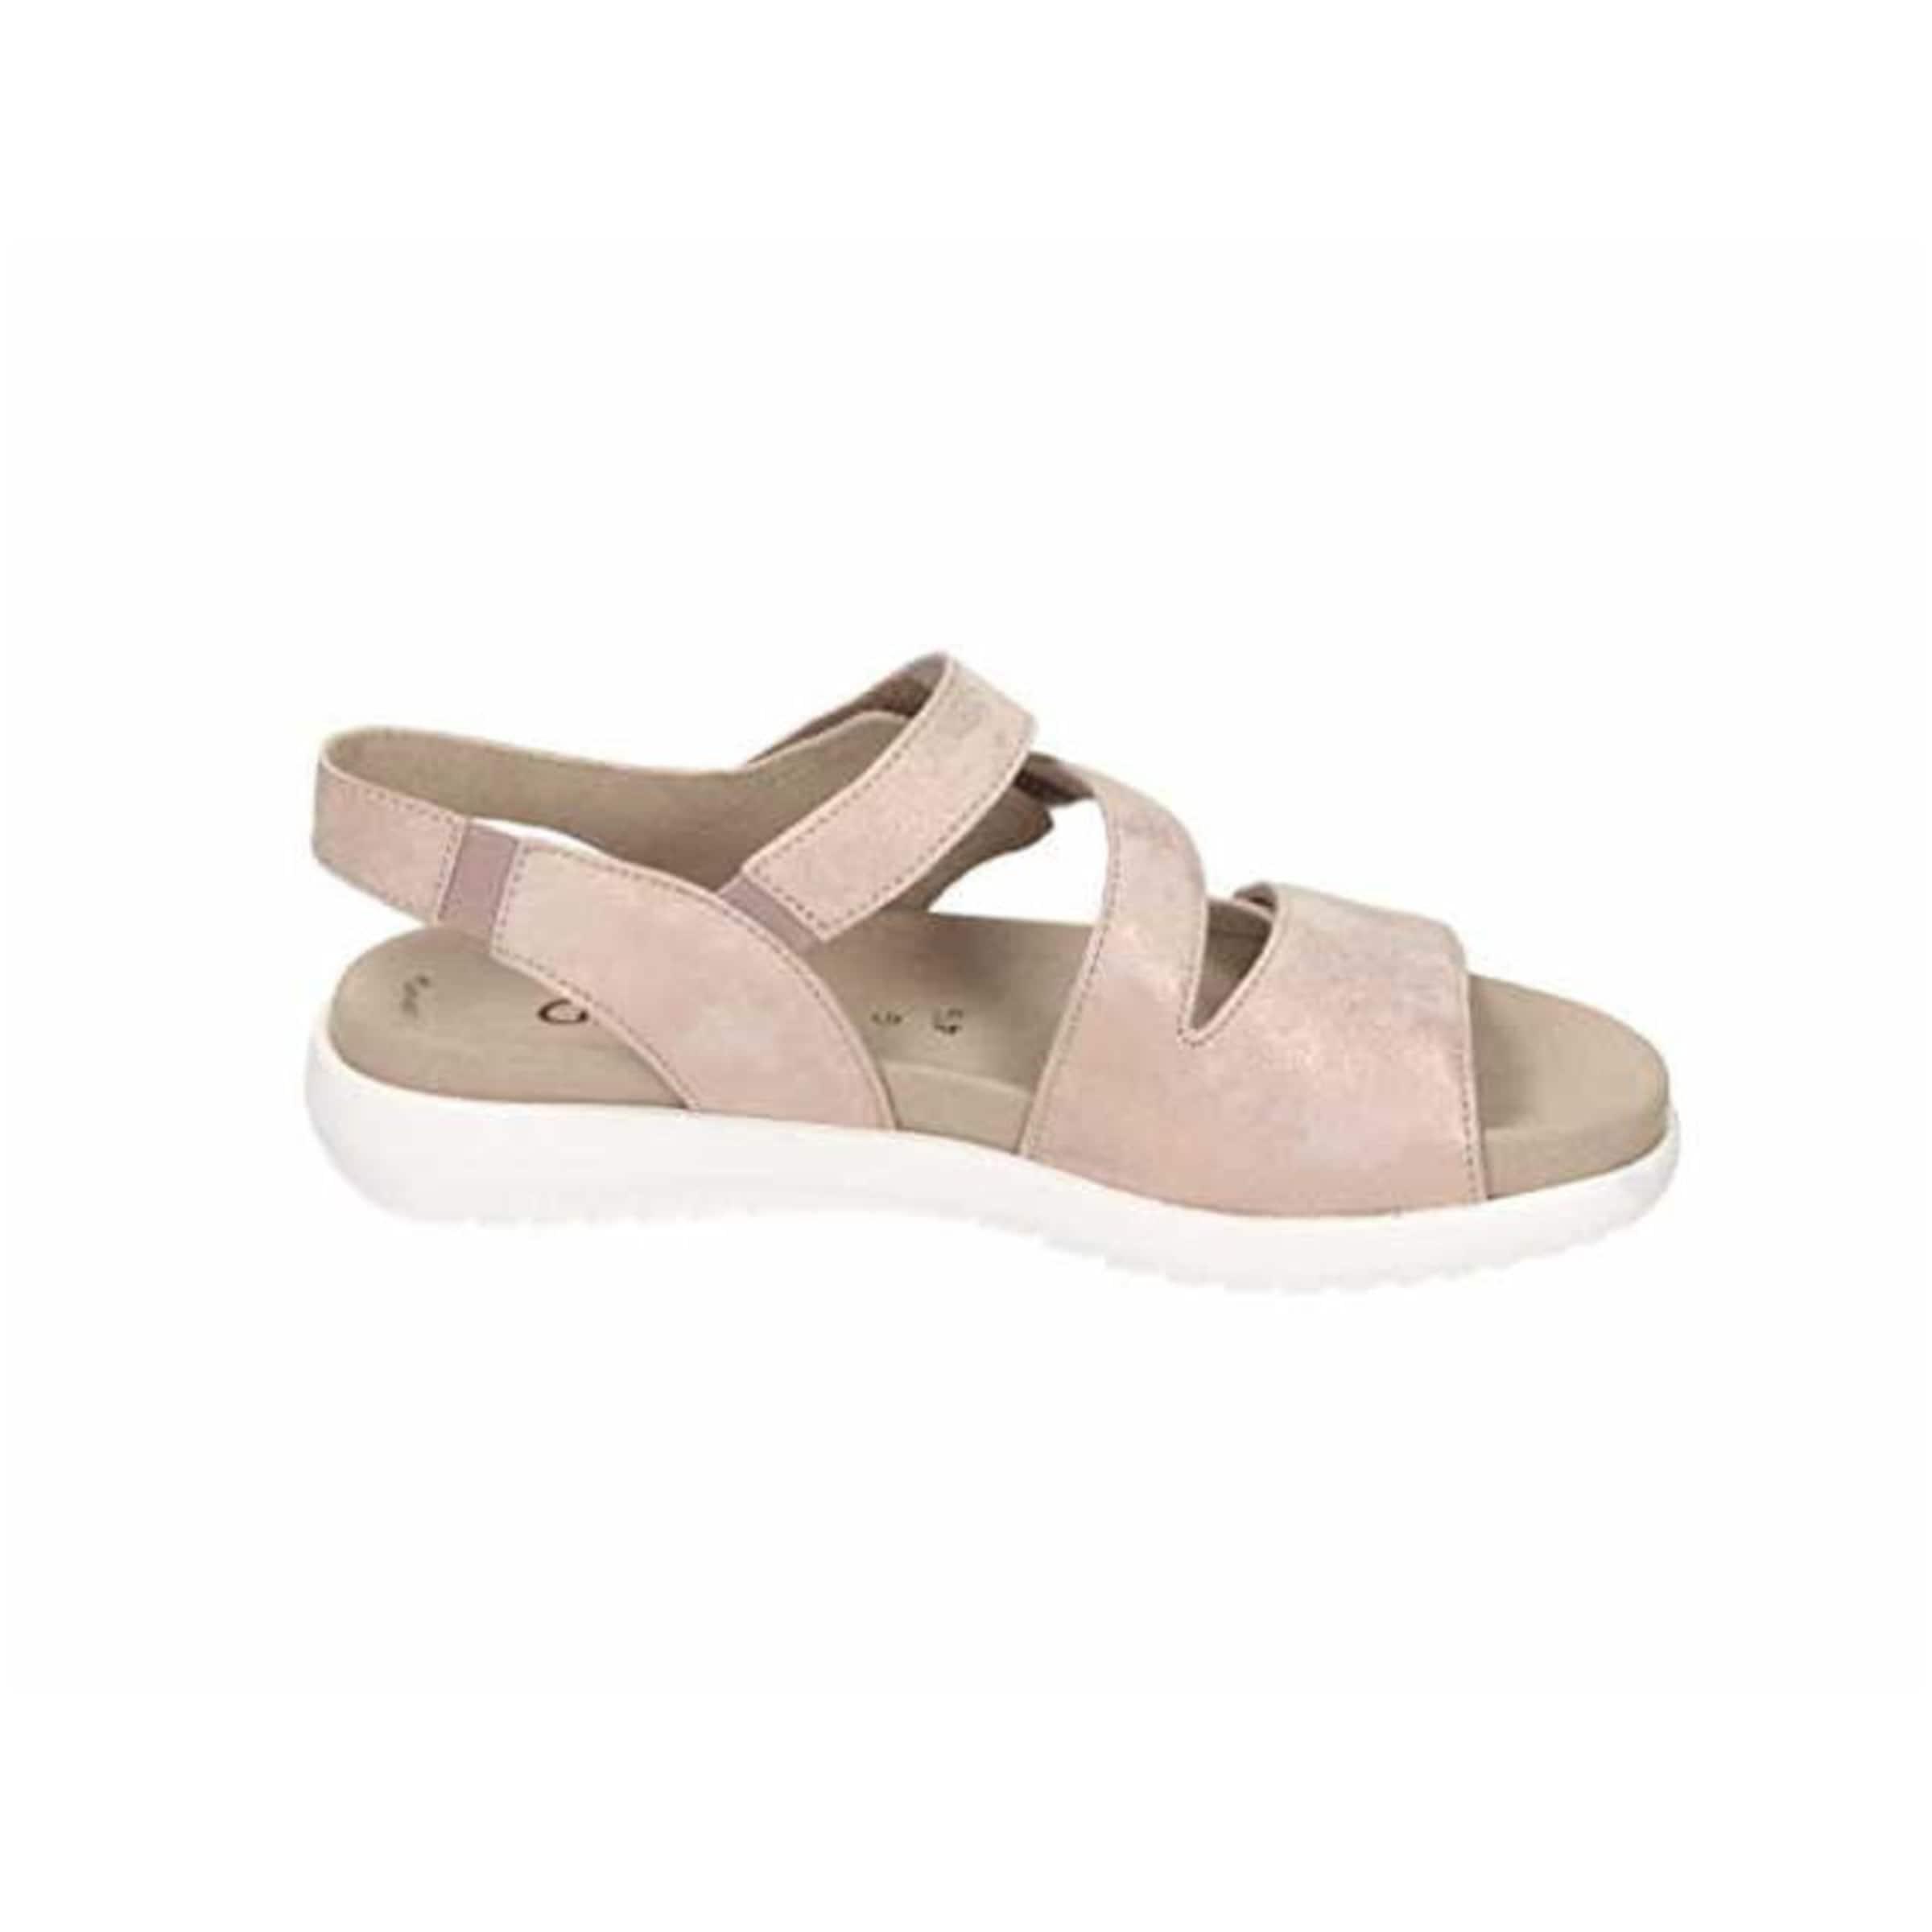 Sandalen sandaletten sandaletten In In Altrosa Gabor Sandalen Gabor Gabor Altrosa redCoxB